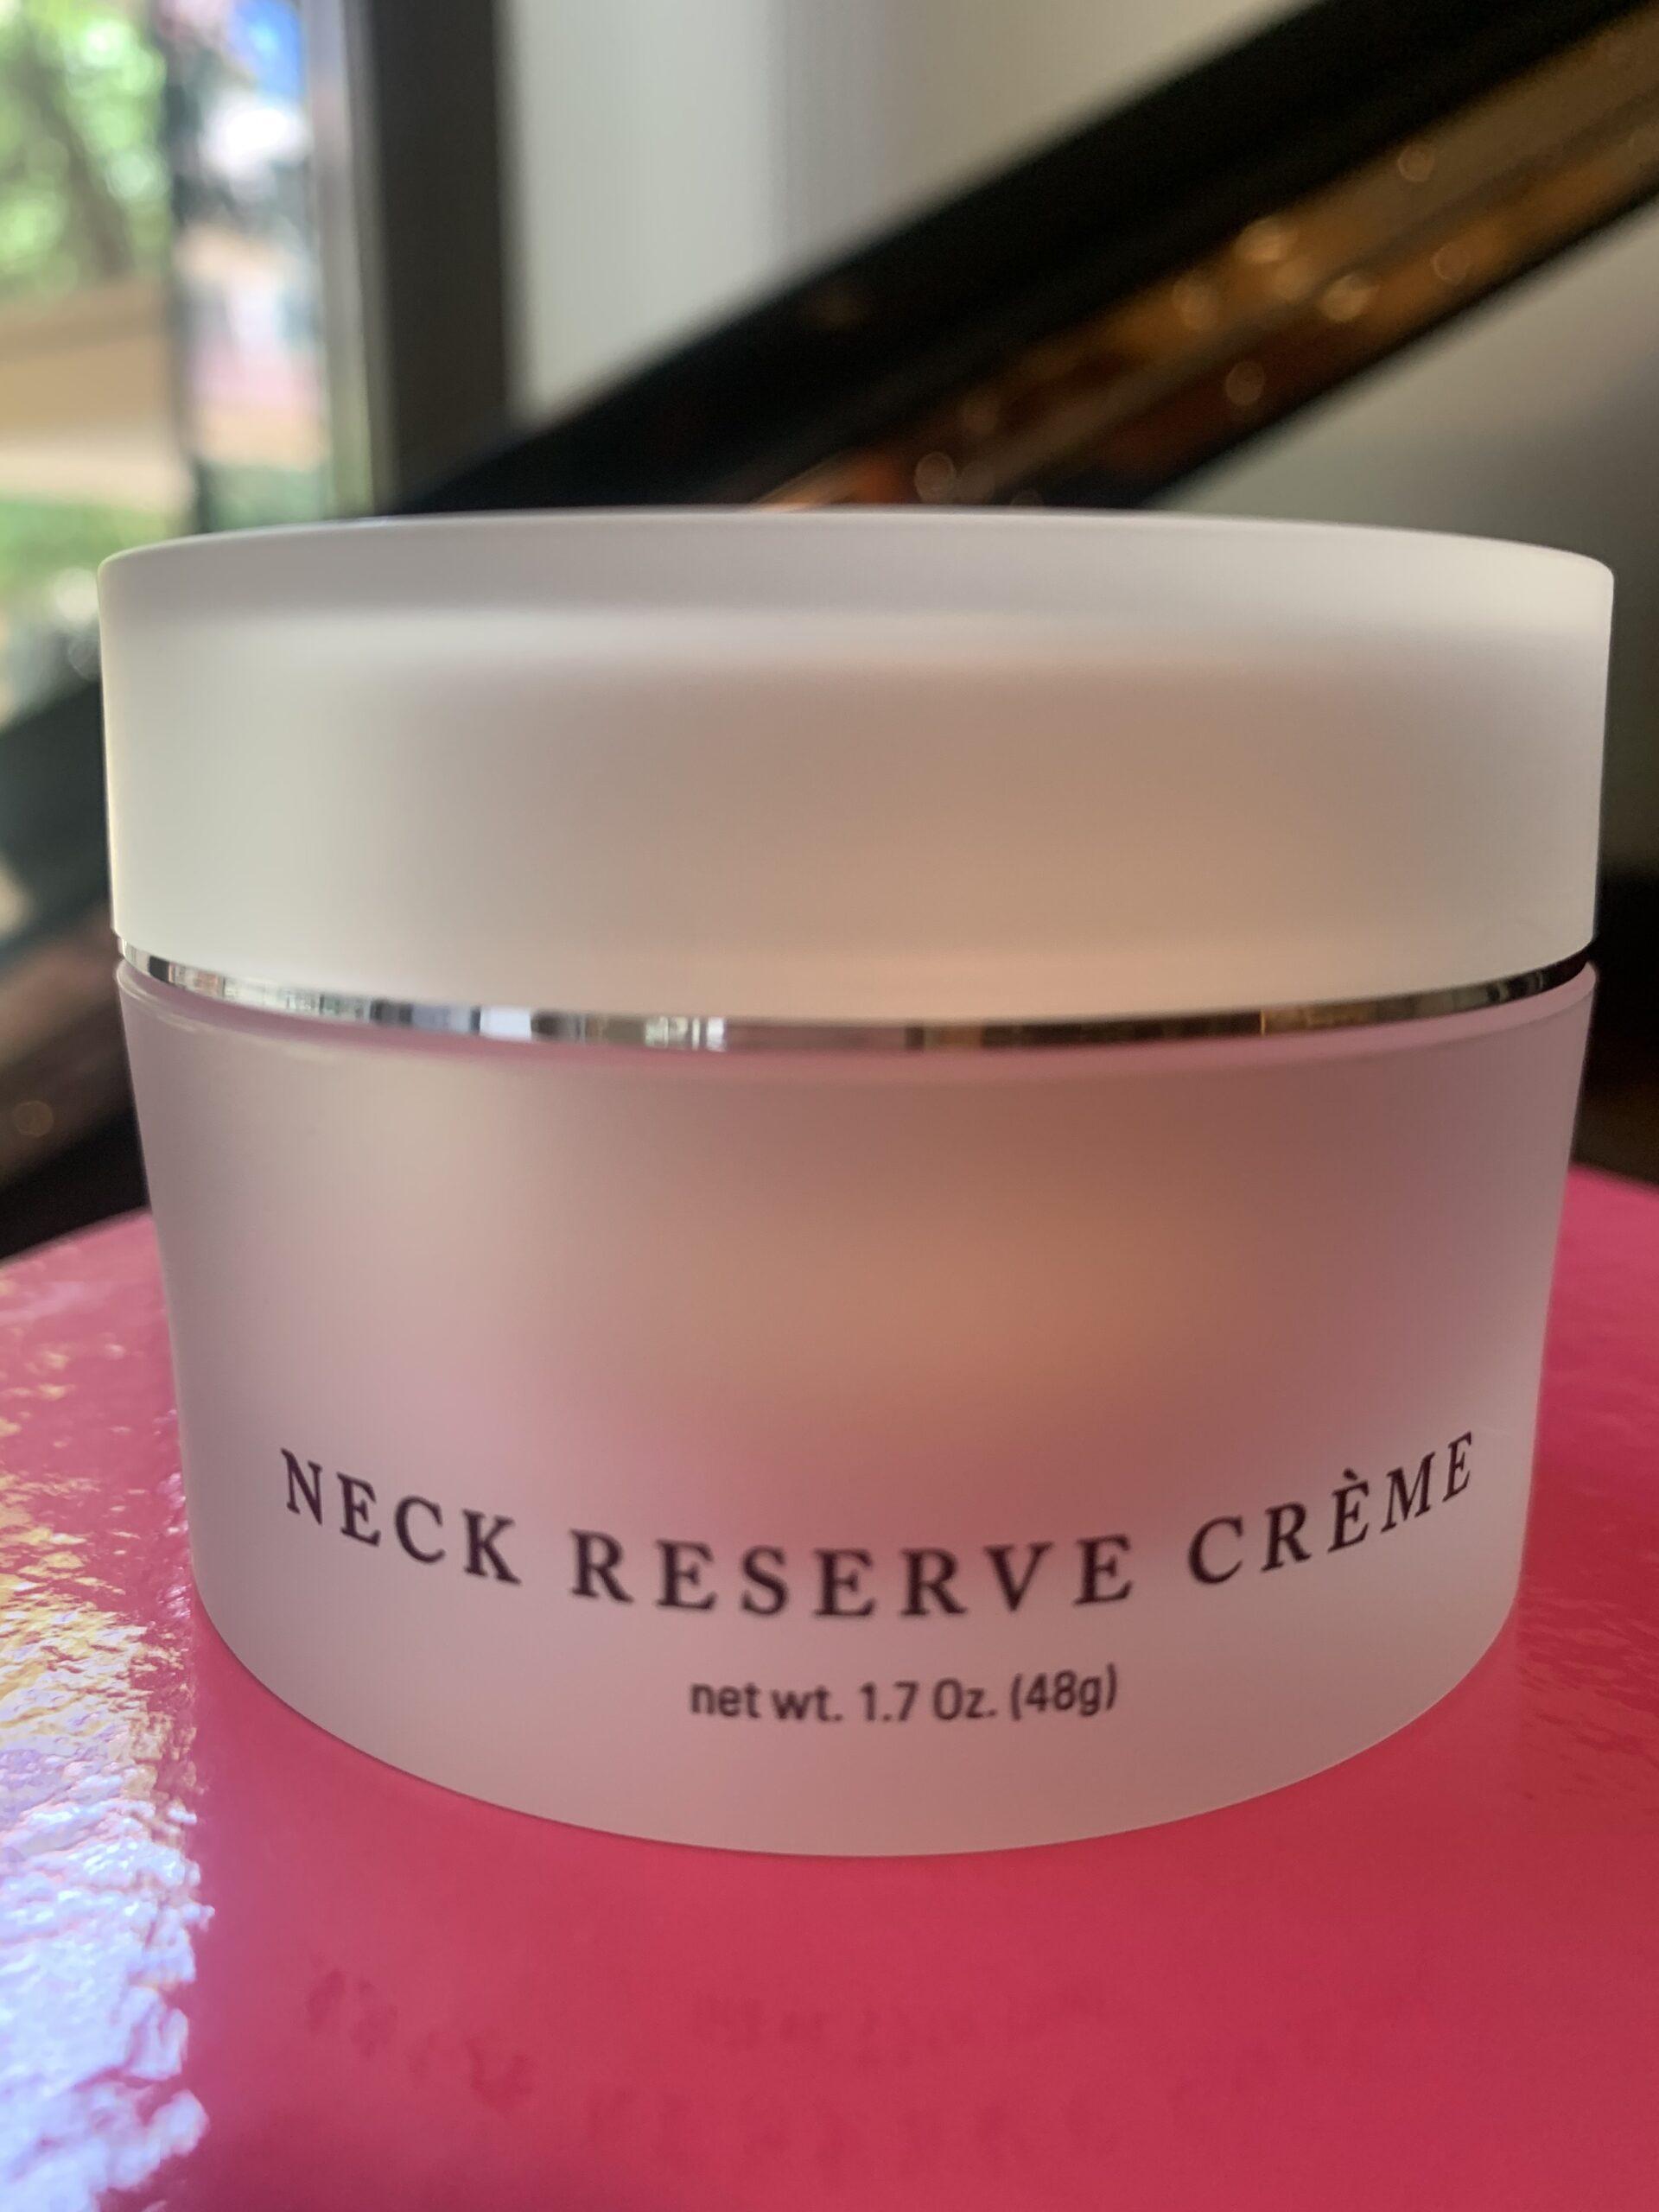 neck reserve creme